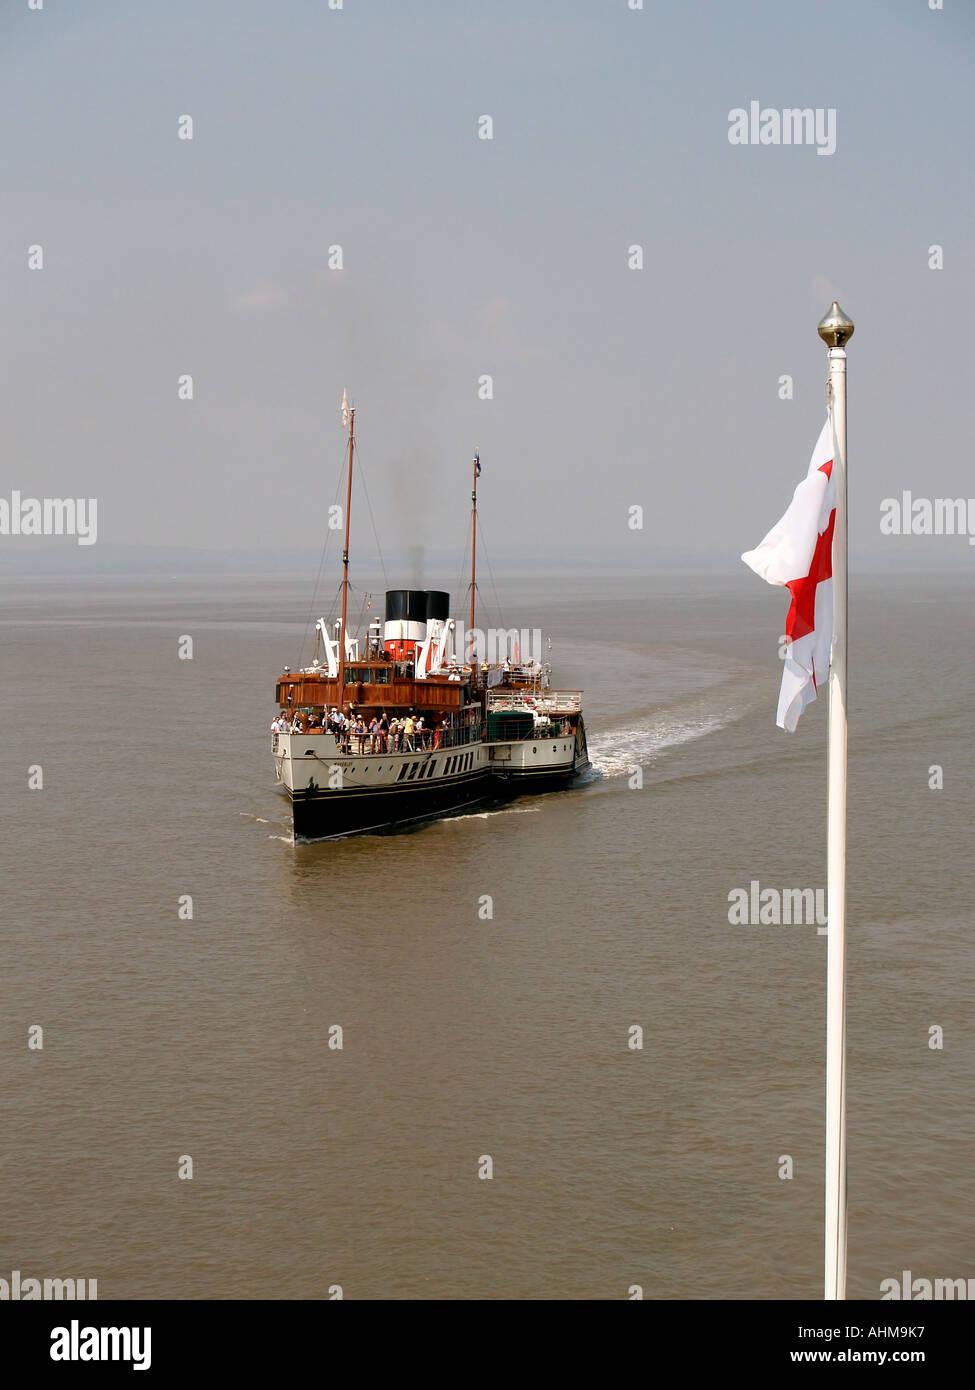 Paddle Steamer Waverley arriving at Clevedon Pier - Stock Image